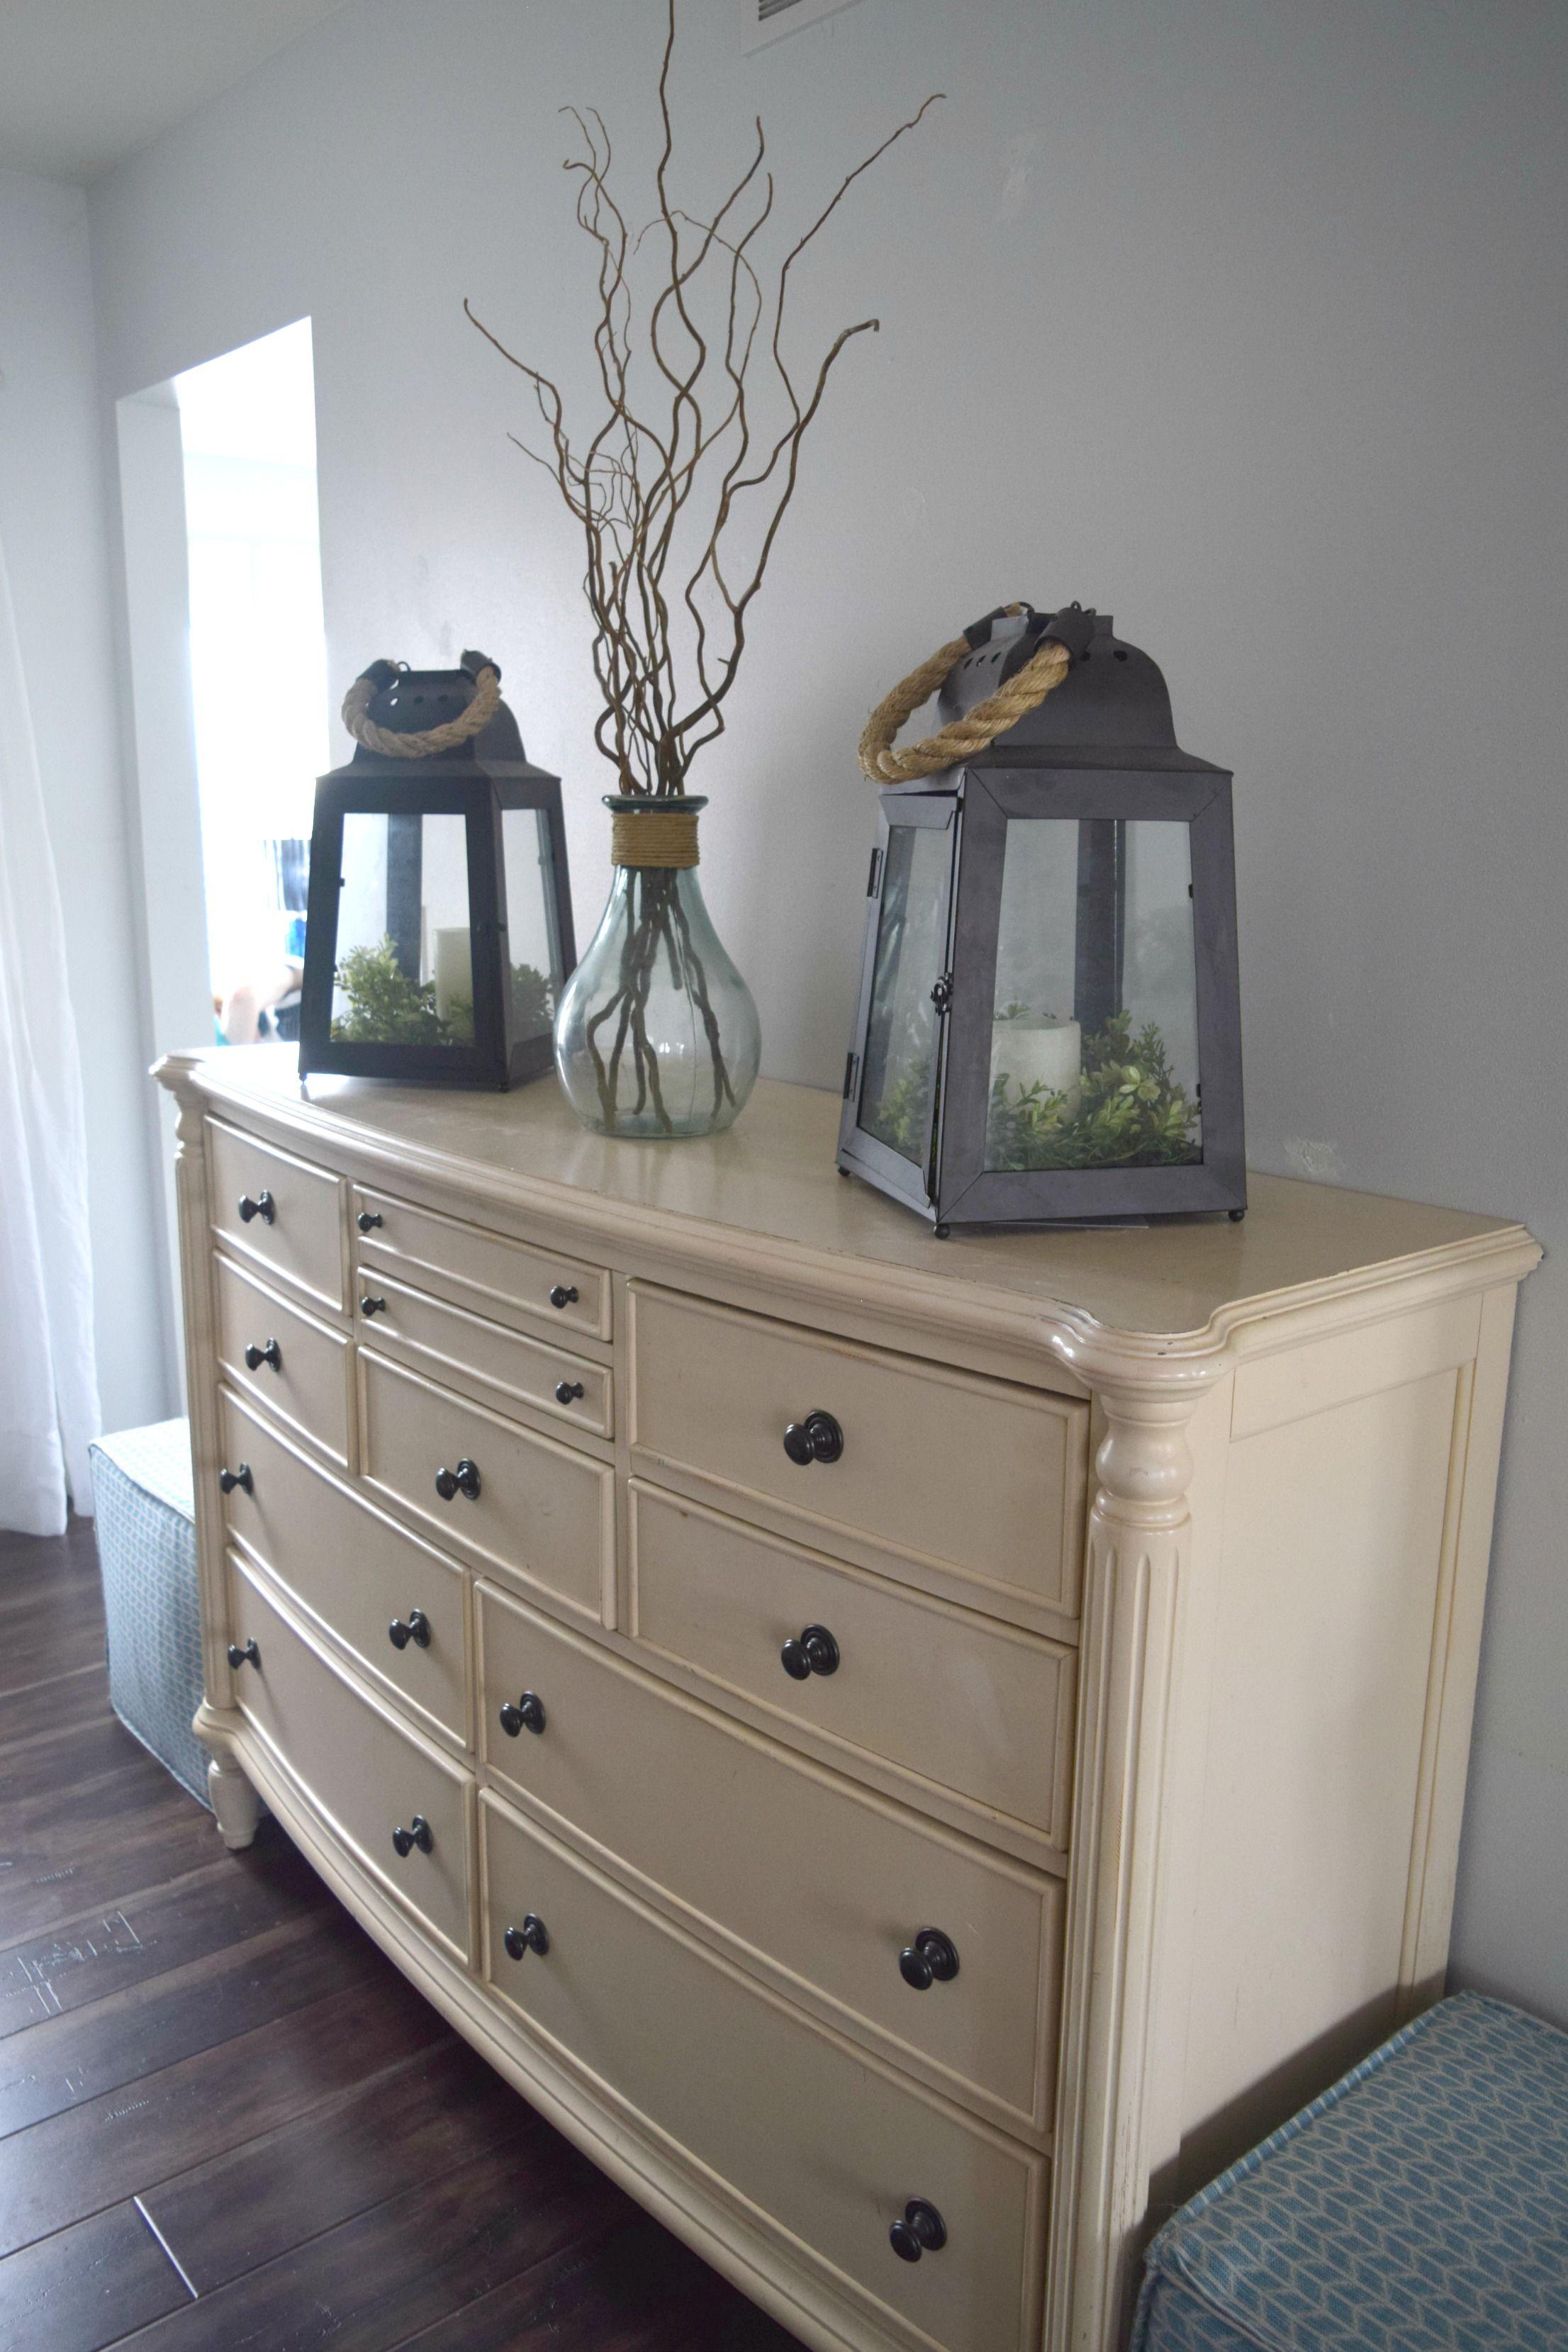 90+type Simple Home Decor diy  #simplehomedecor